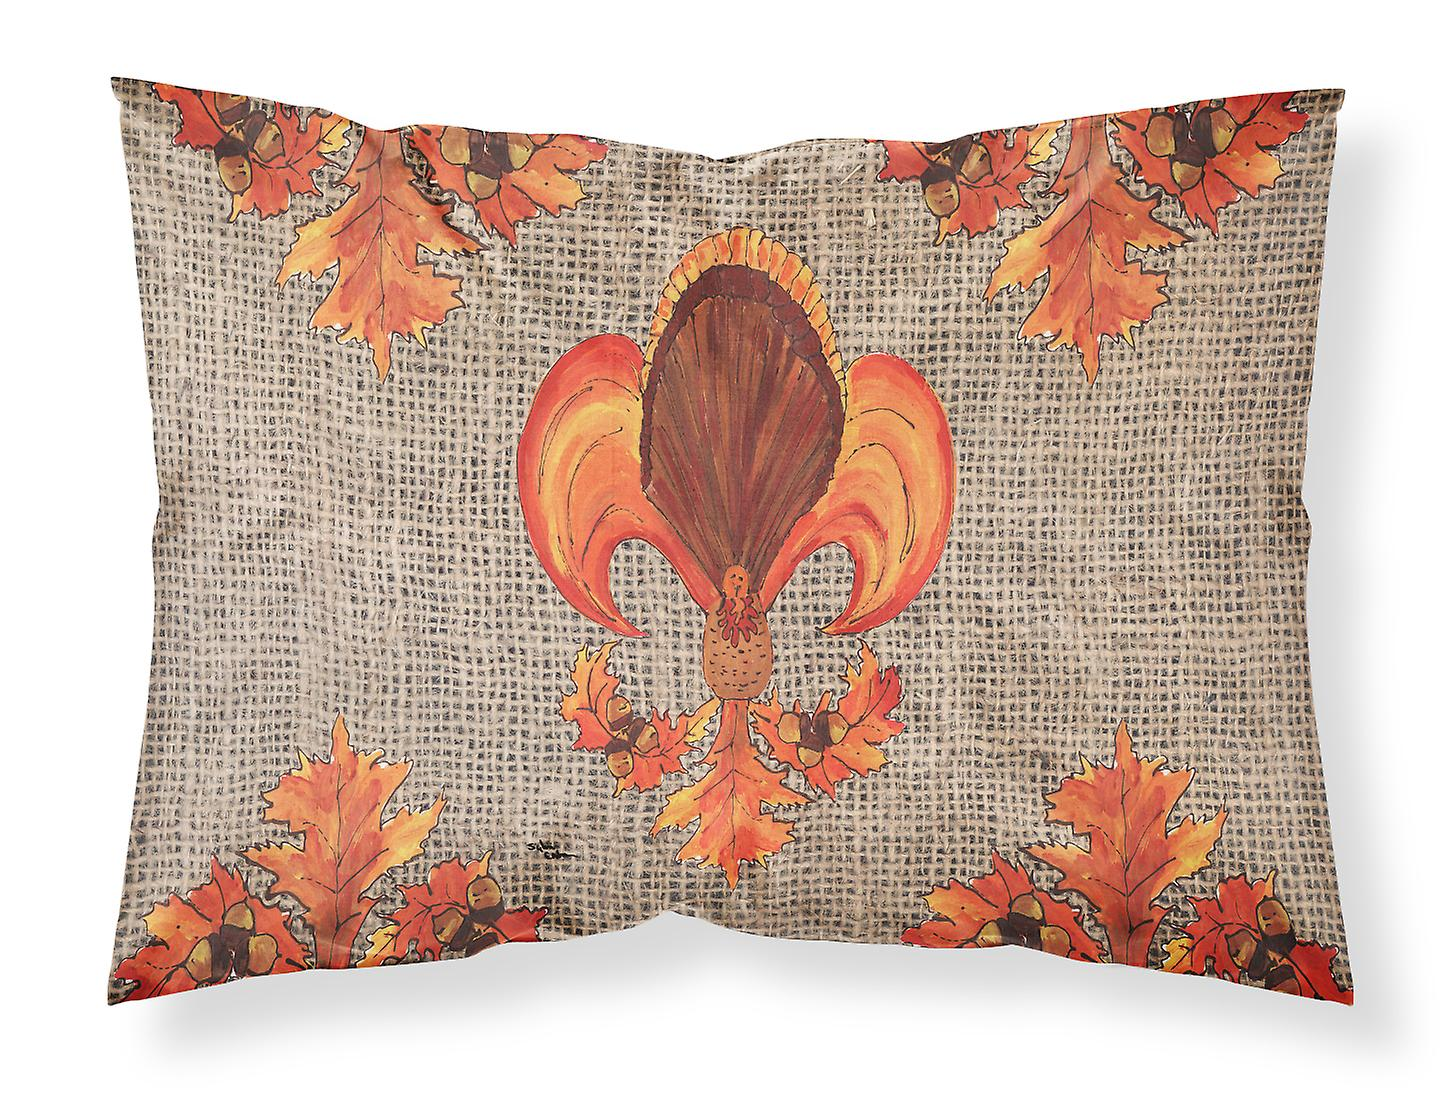 Turquie L'humidité Tissu Fleur De Standard Lis Taie D'oreiller Thanksgiving Wicking Nnw0vm8